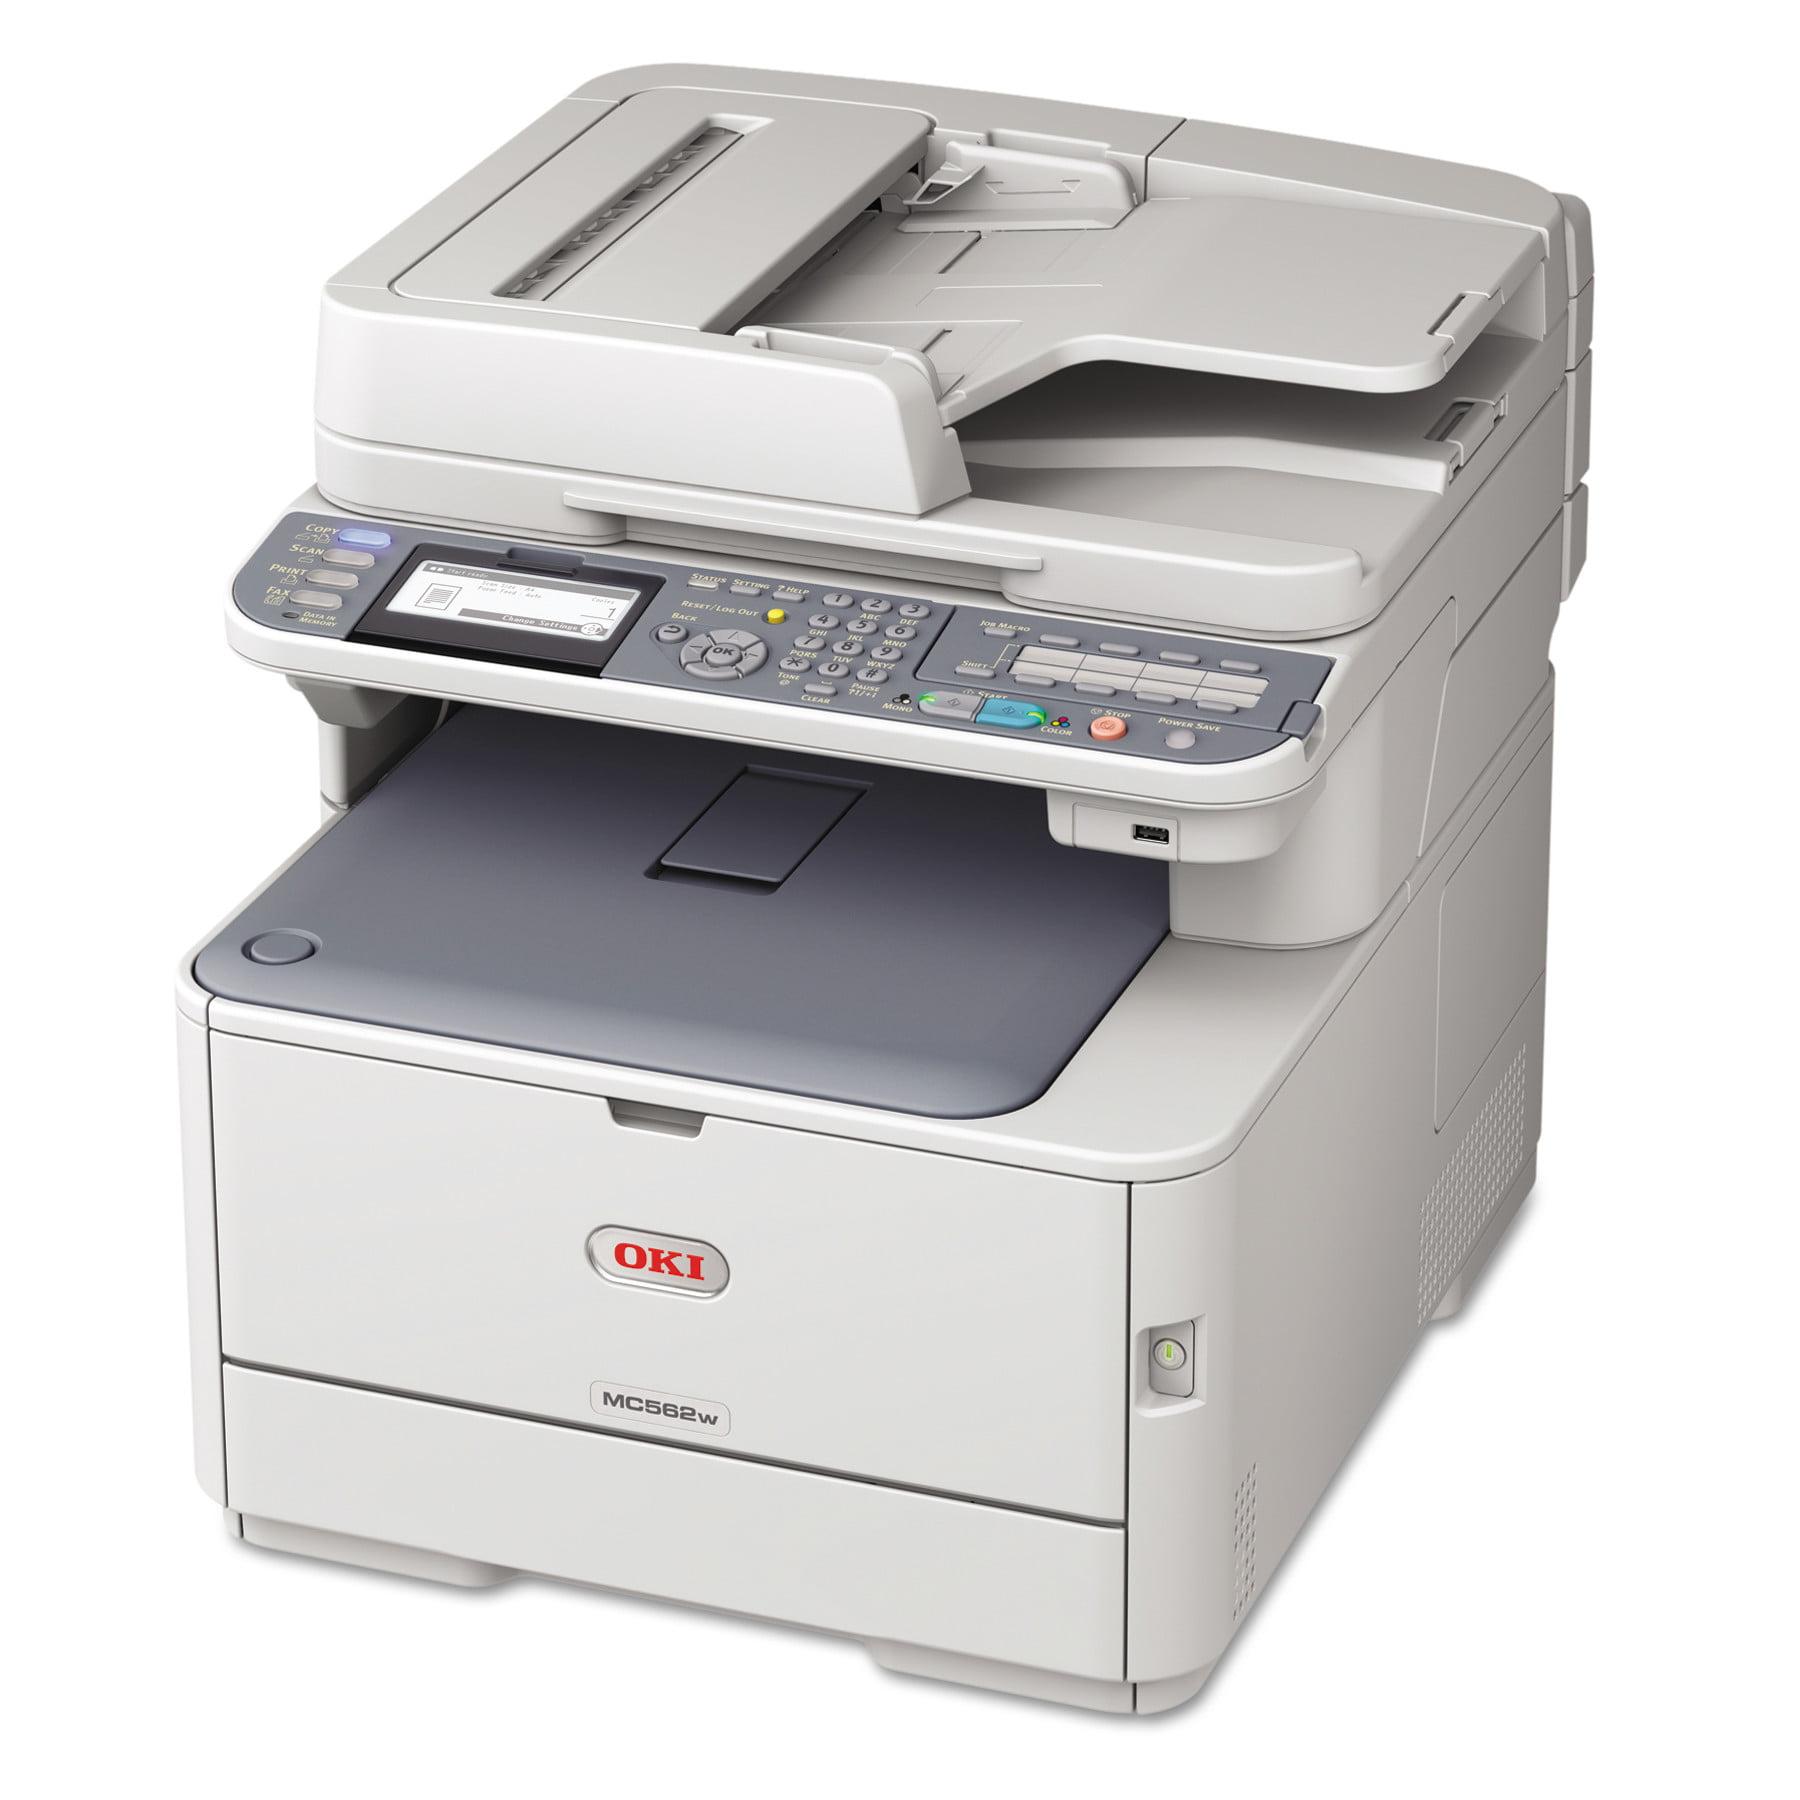 Oki MC562w Wireless Multifunction Color Laser Printer, Copy/Fax/Print/Scan